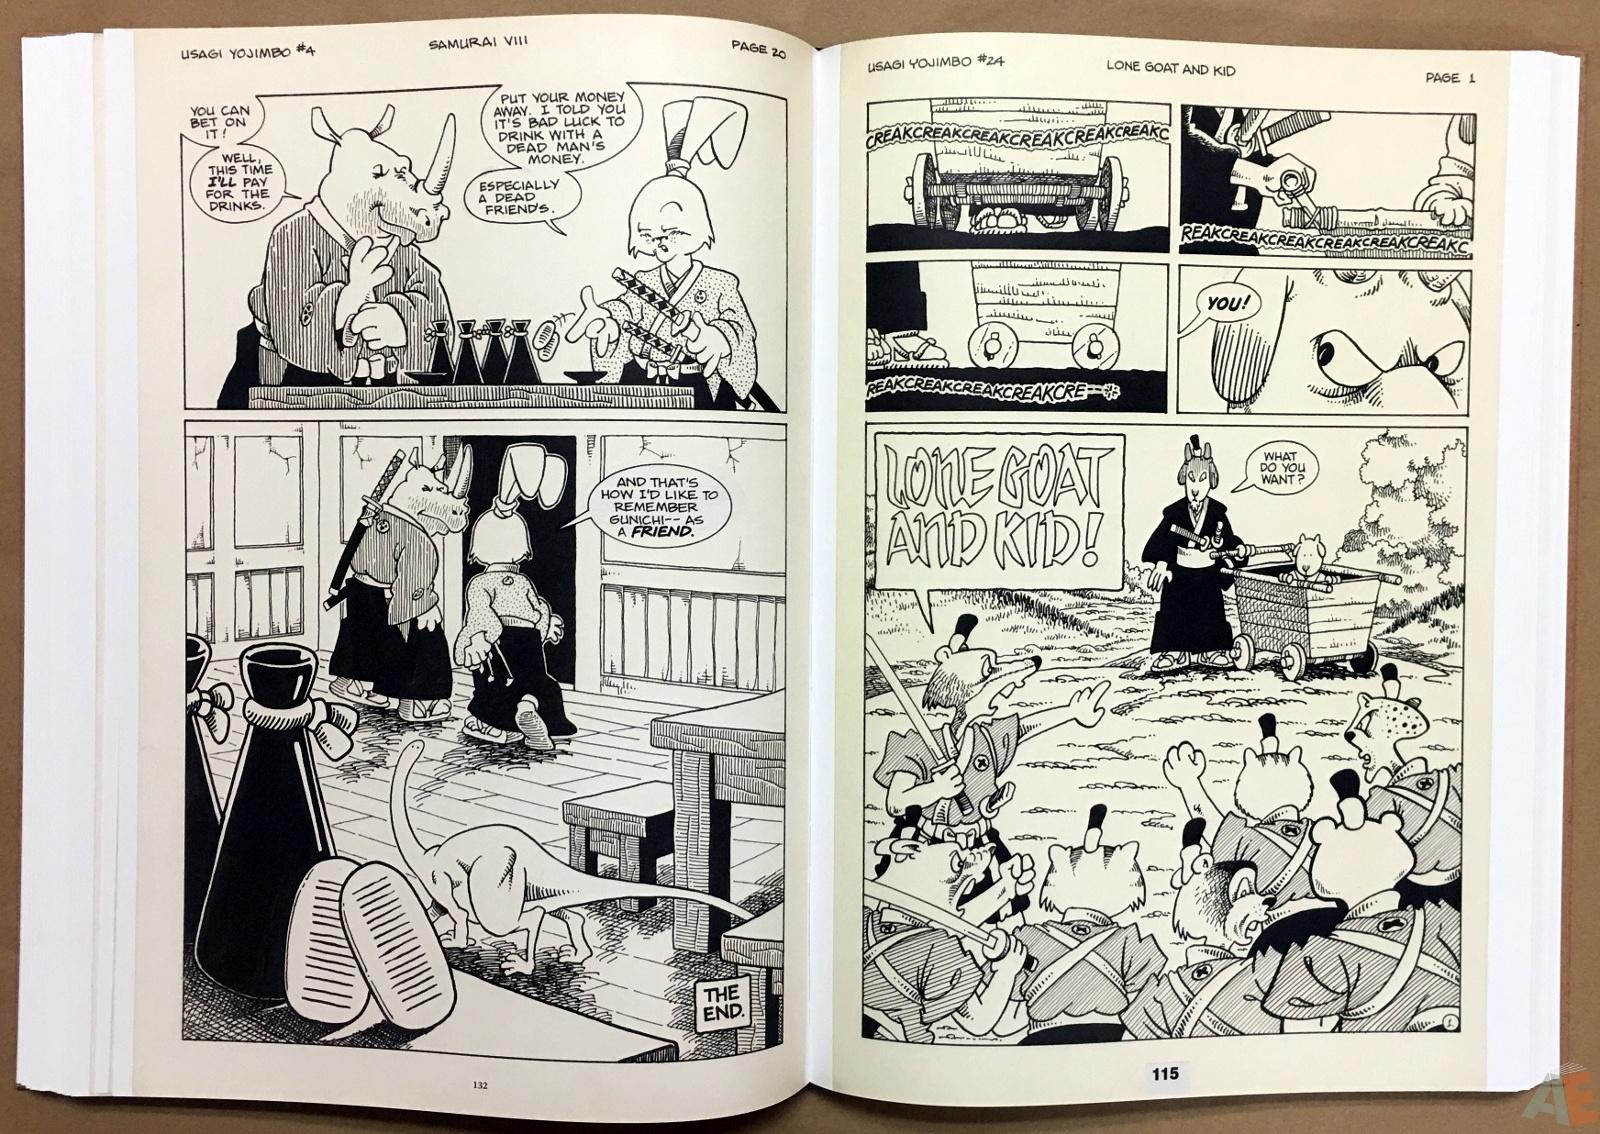 Usagi Yojimbo: Samurai and Other Stories Gallery Edition 26